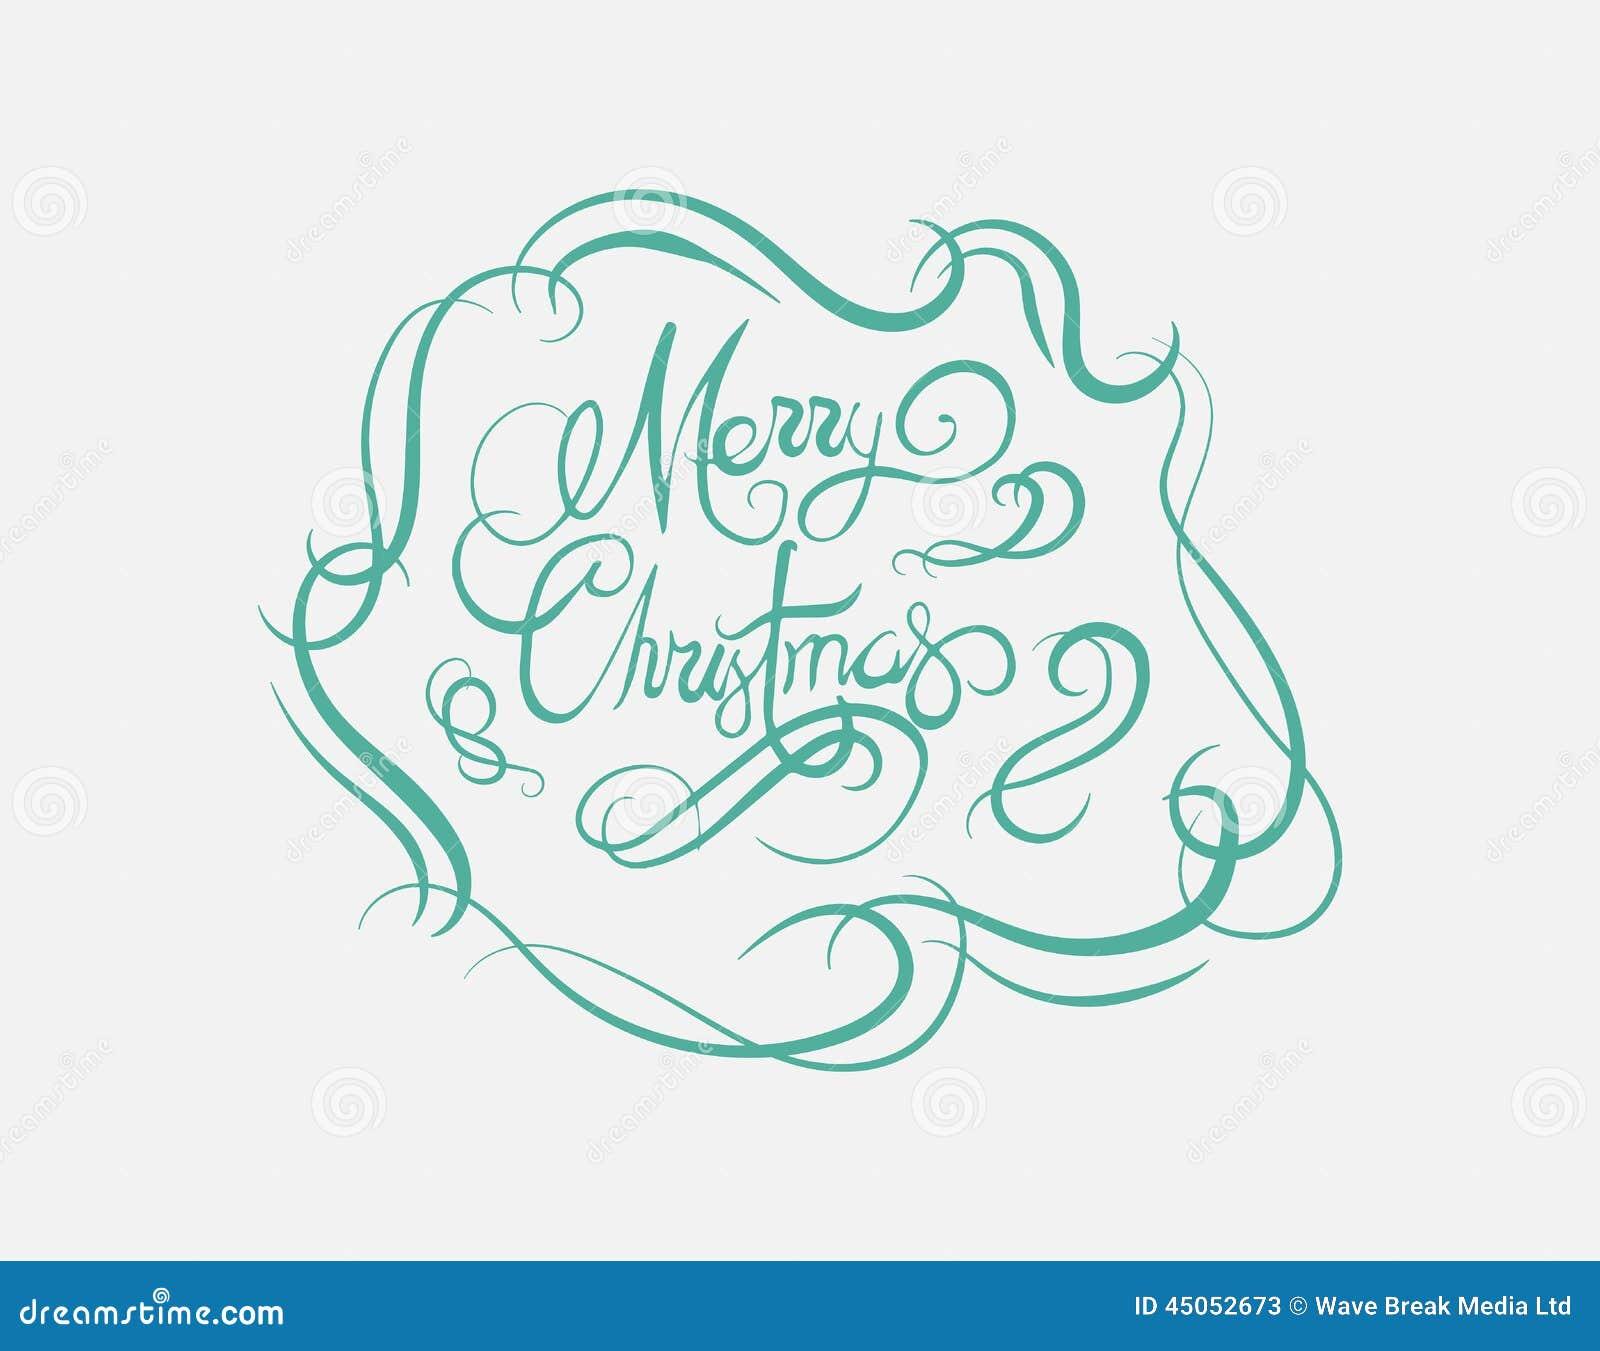 download merry christmas message vector in cursive green stock vector illustration of illustration festivity